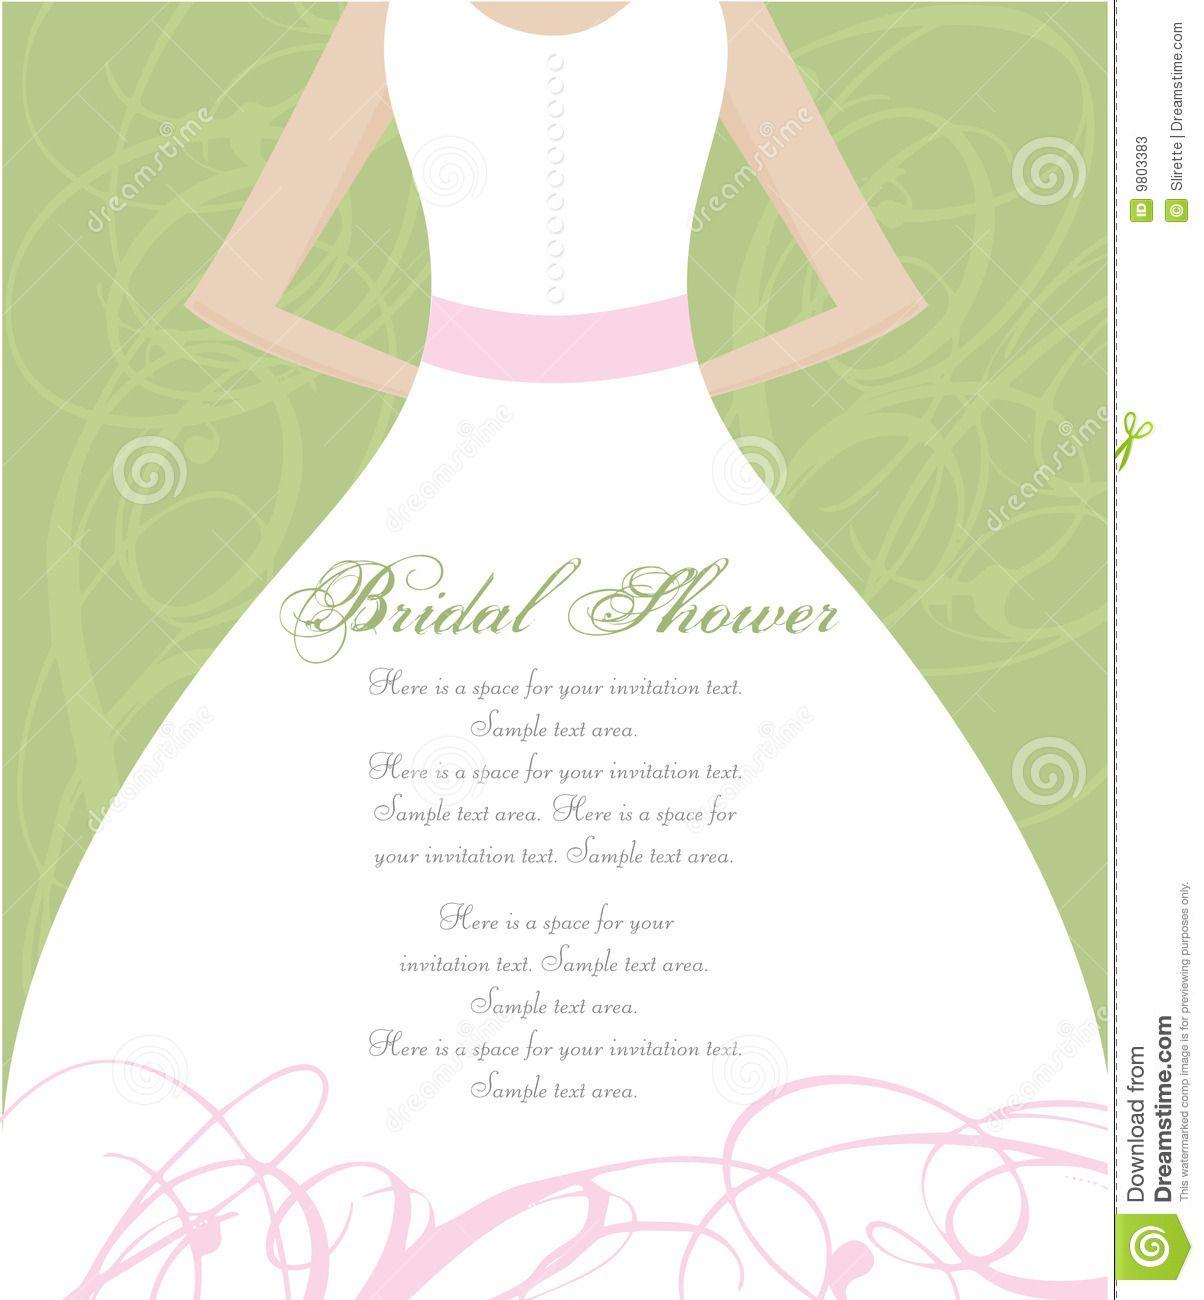 bridal shower invitation wording elegant bridal shower invitation wording baby shower invitations sweet